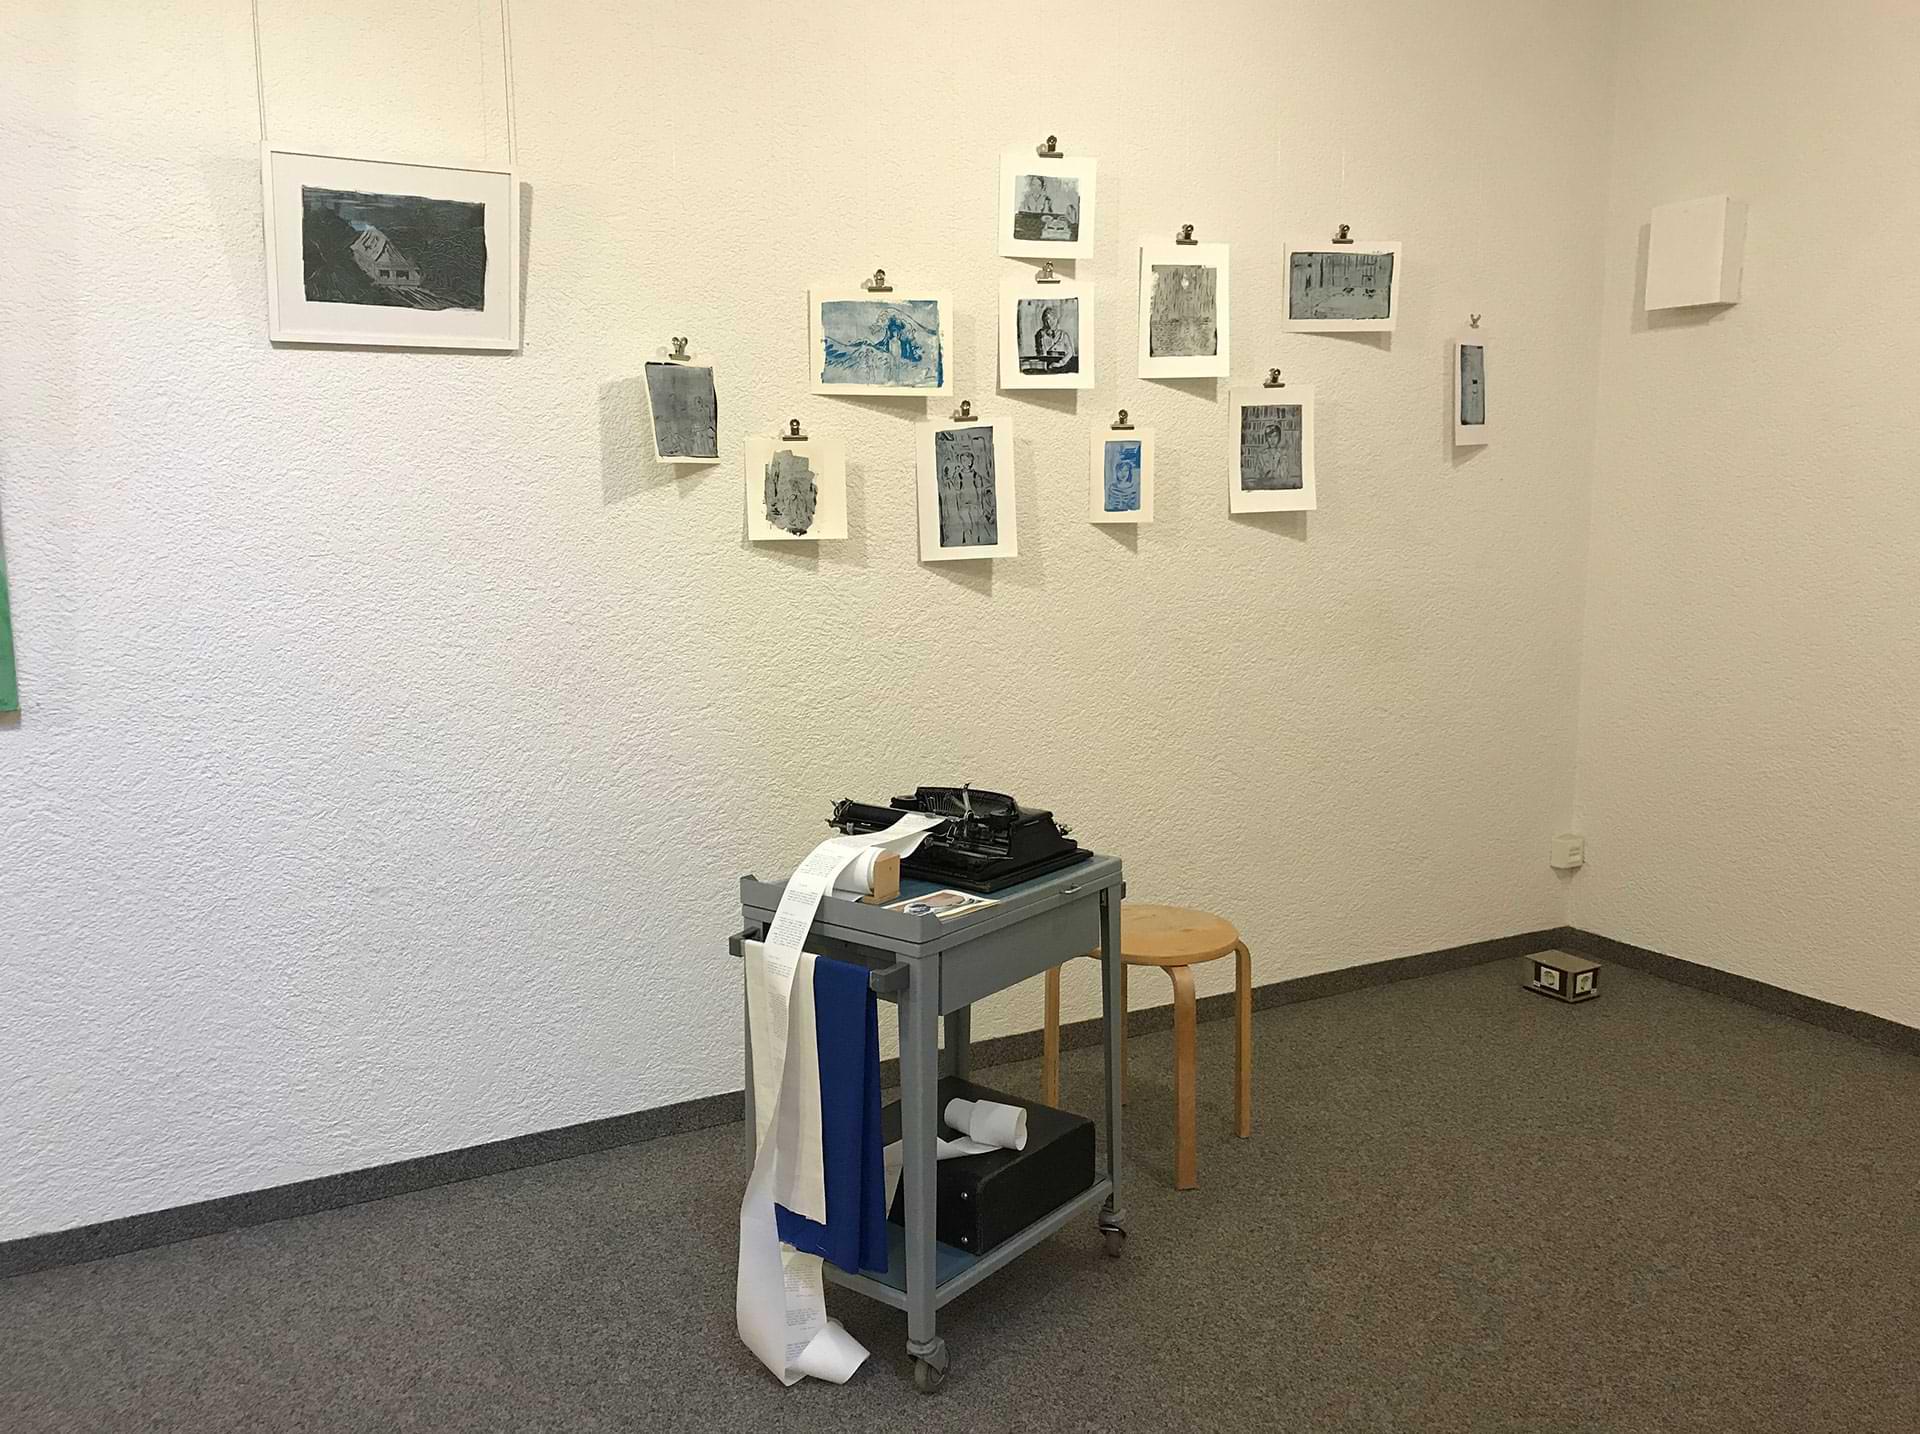 christianehaag-theboywholefthome-büchereipfullingen-kunst-art-linoldruck-linoprint-japan-harukimurakami(1)